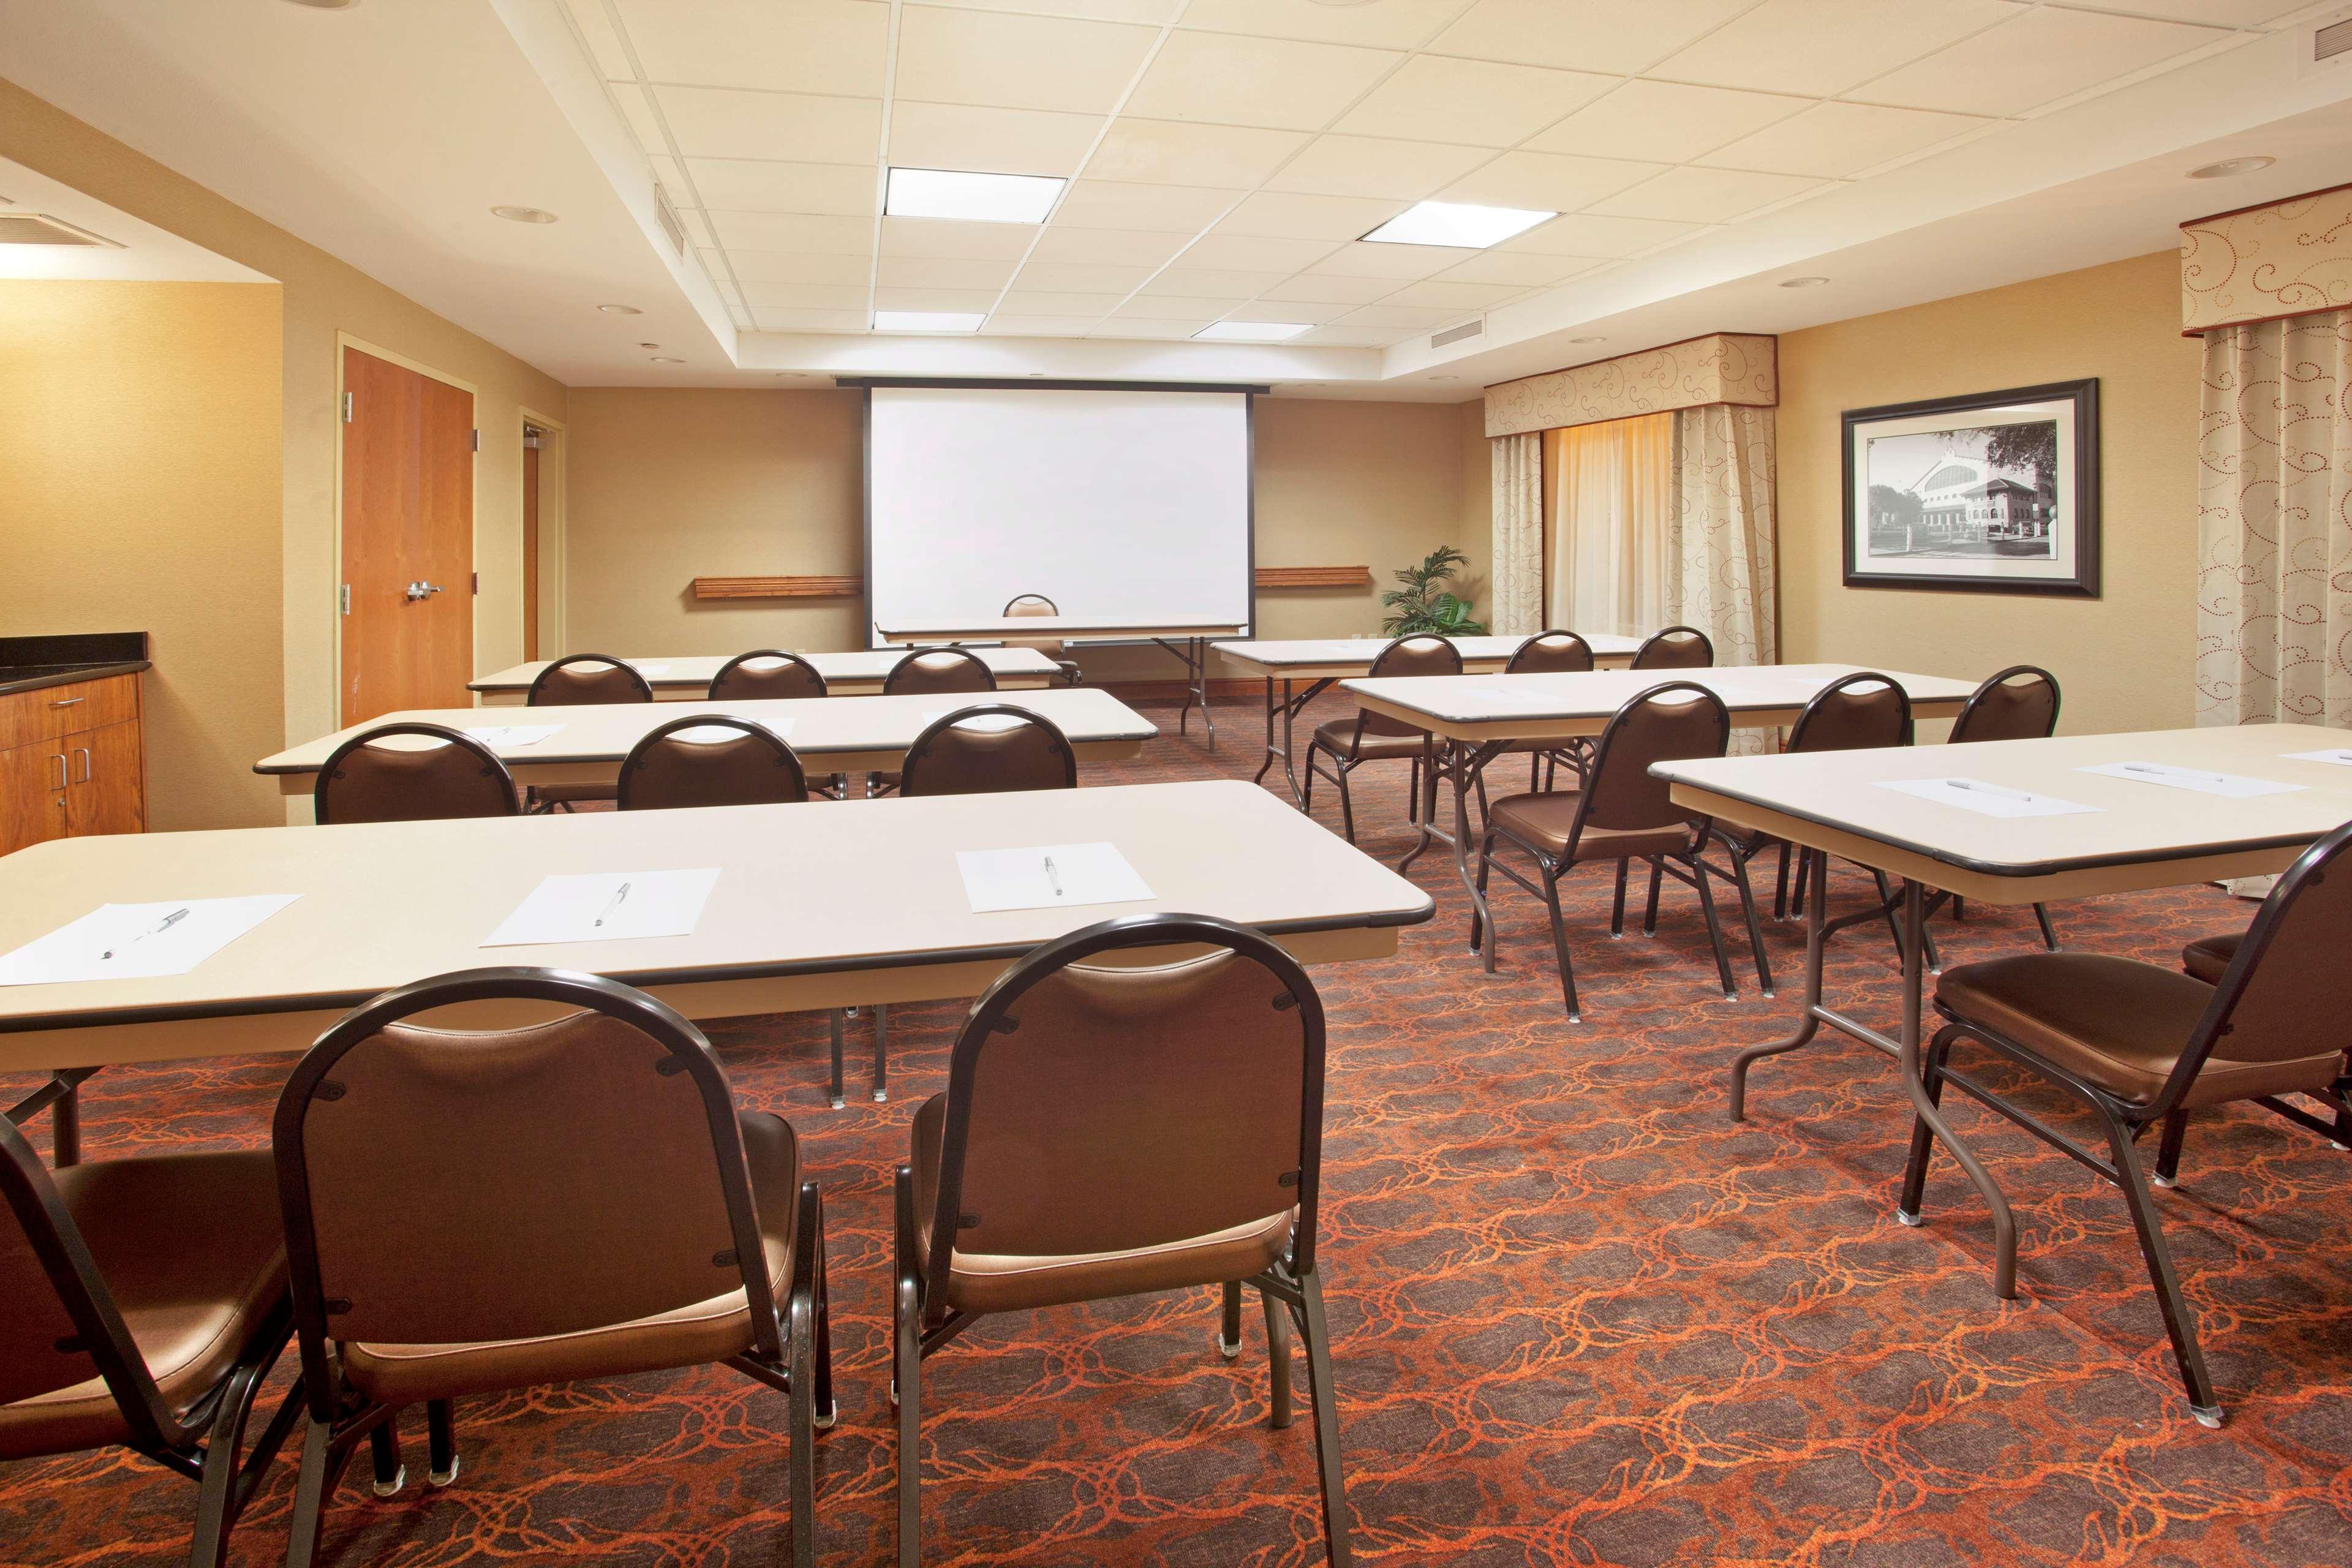 Hampton Inn & Suites Fort Worth-West-I-30 image 16